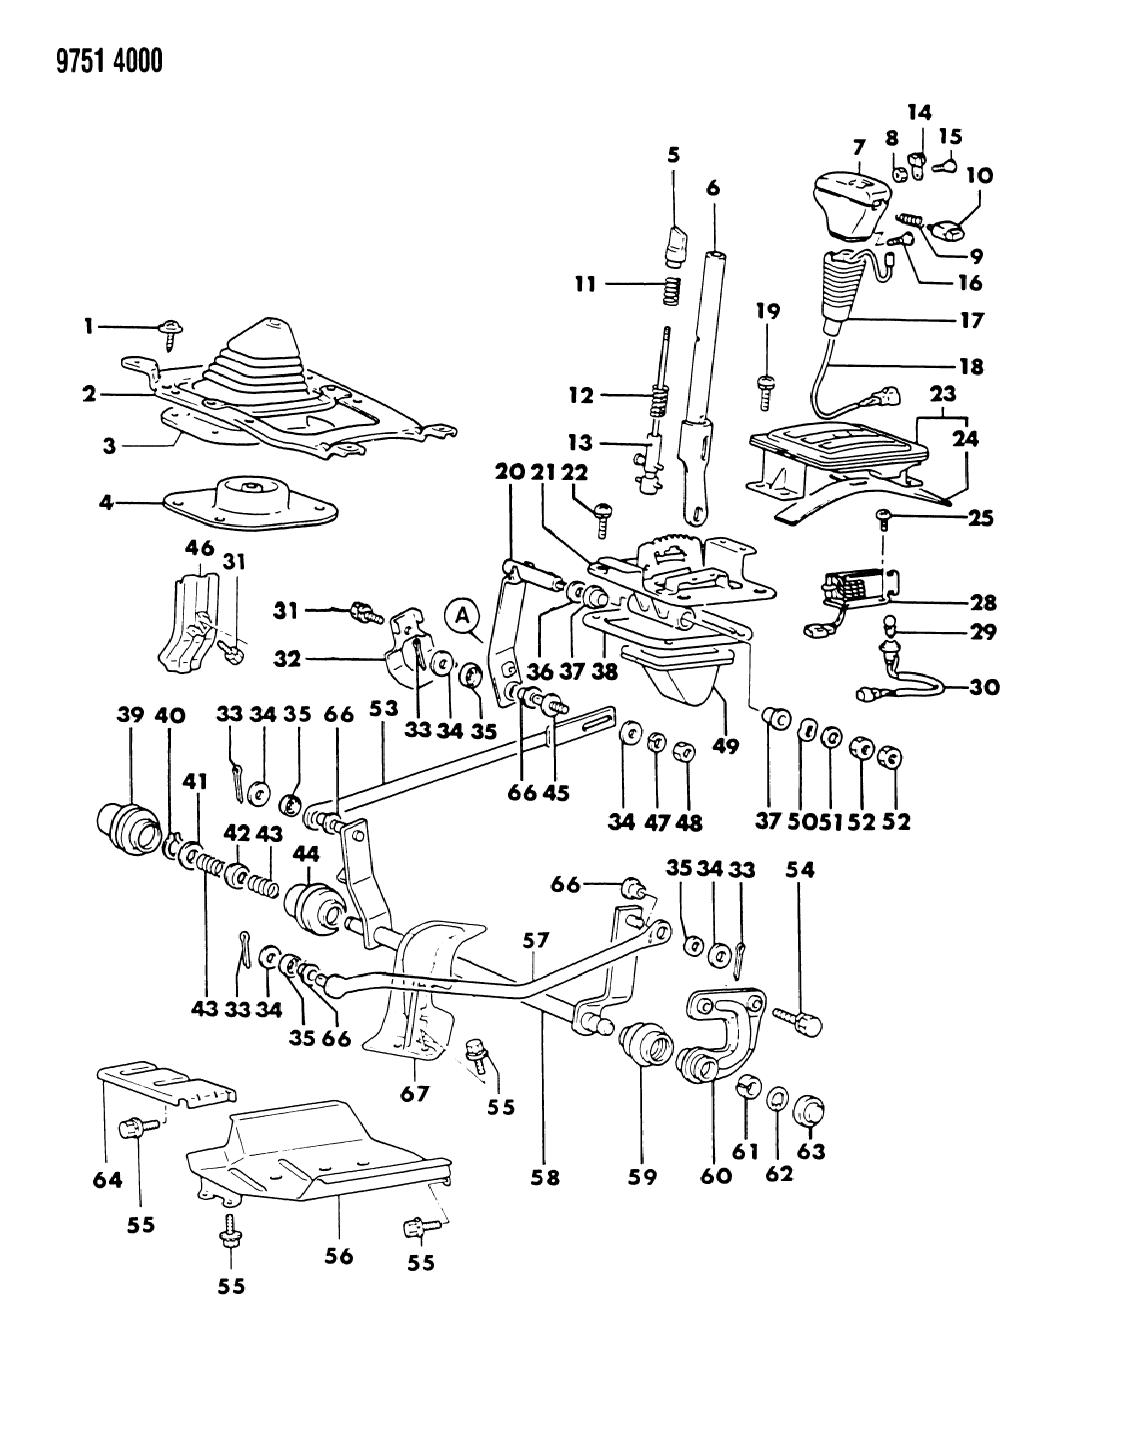 1989 Dodge Raider Controls, Gearshift